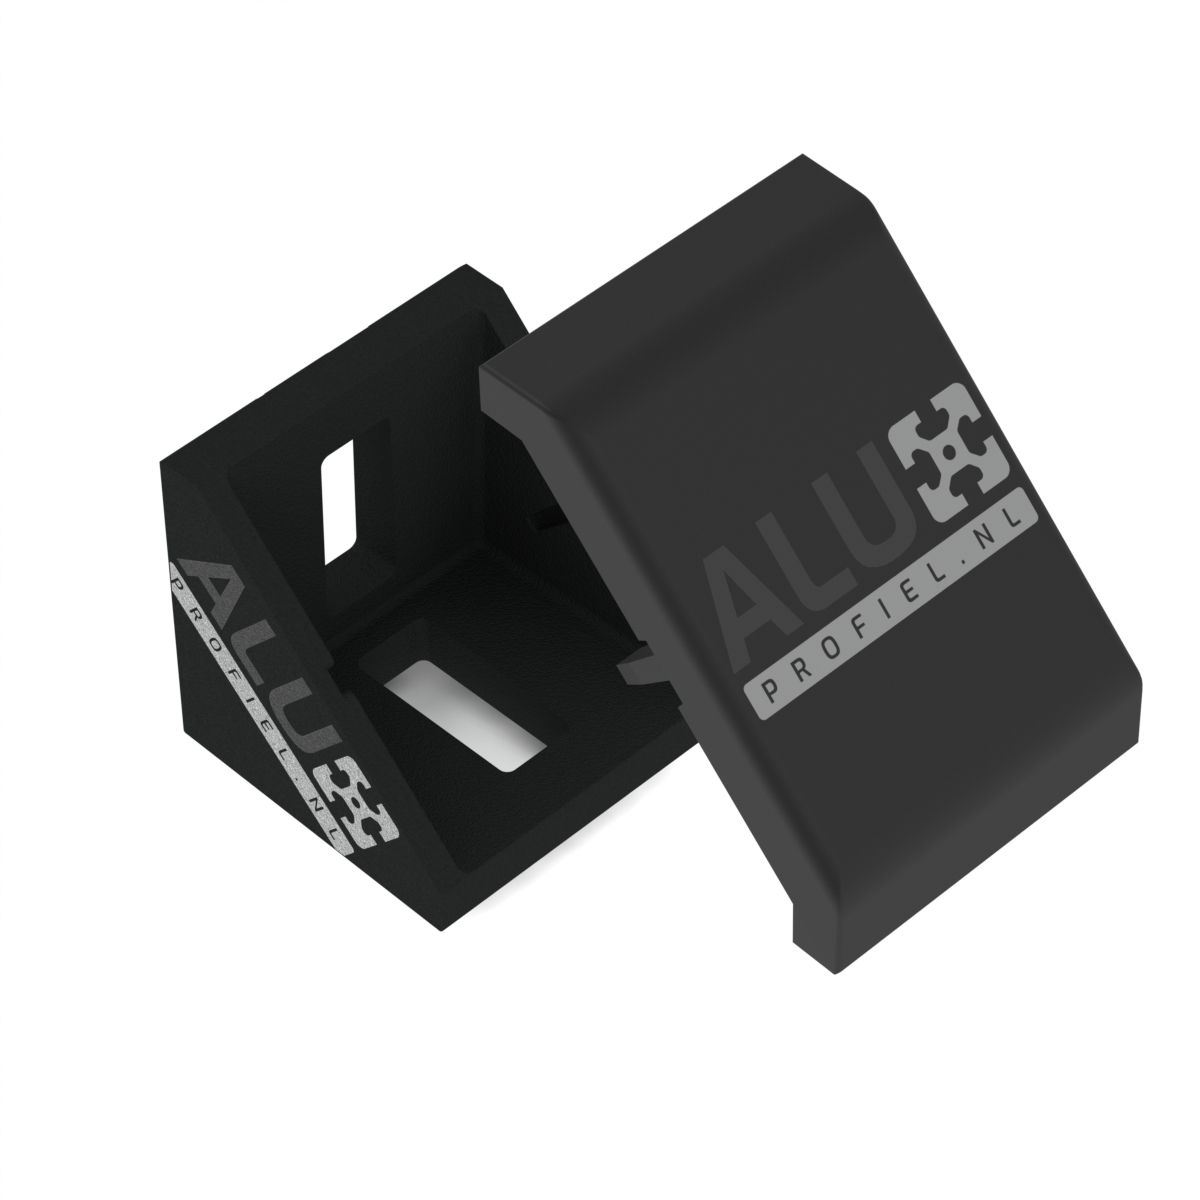 verbindingshoek 4040 zwart afdekkap